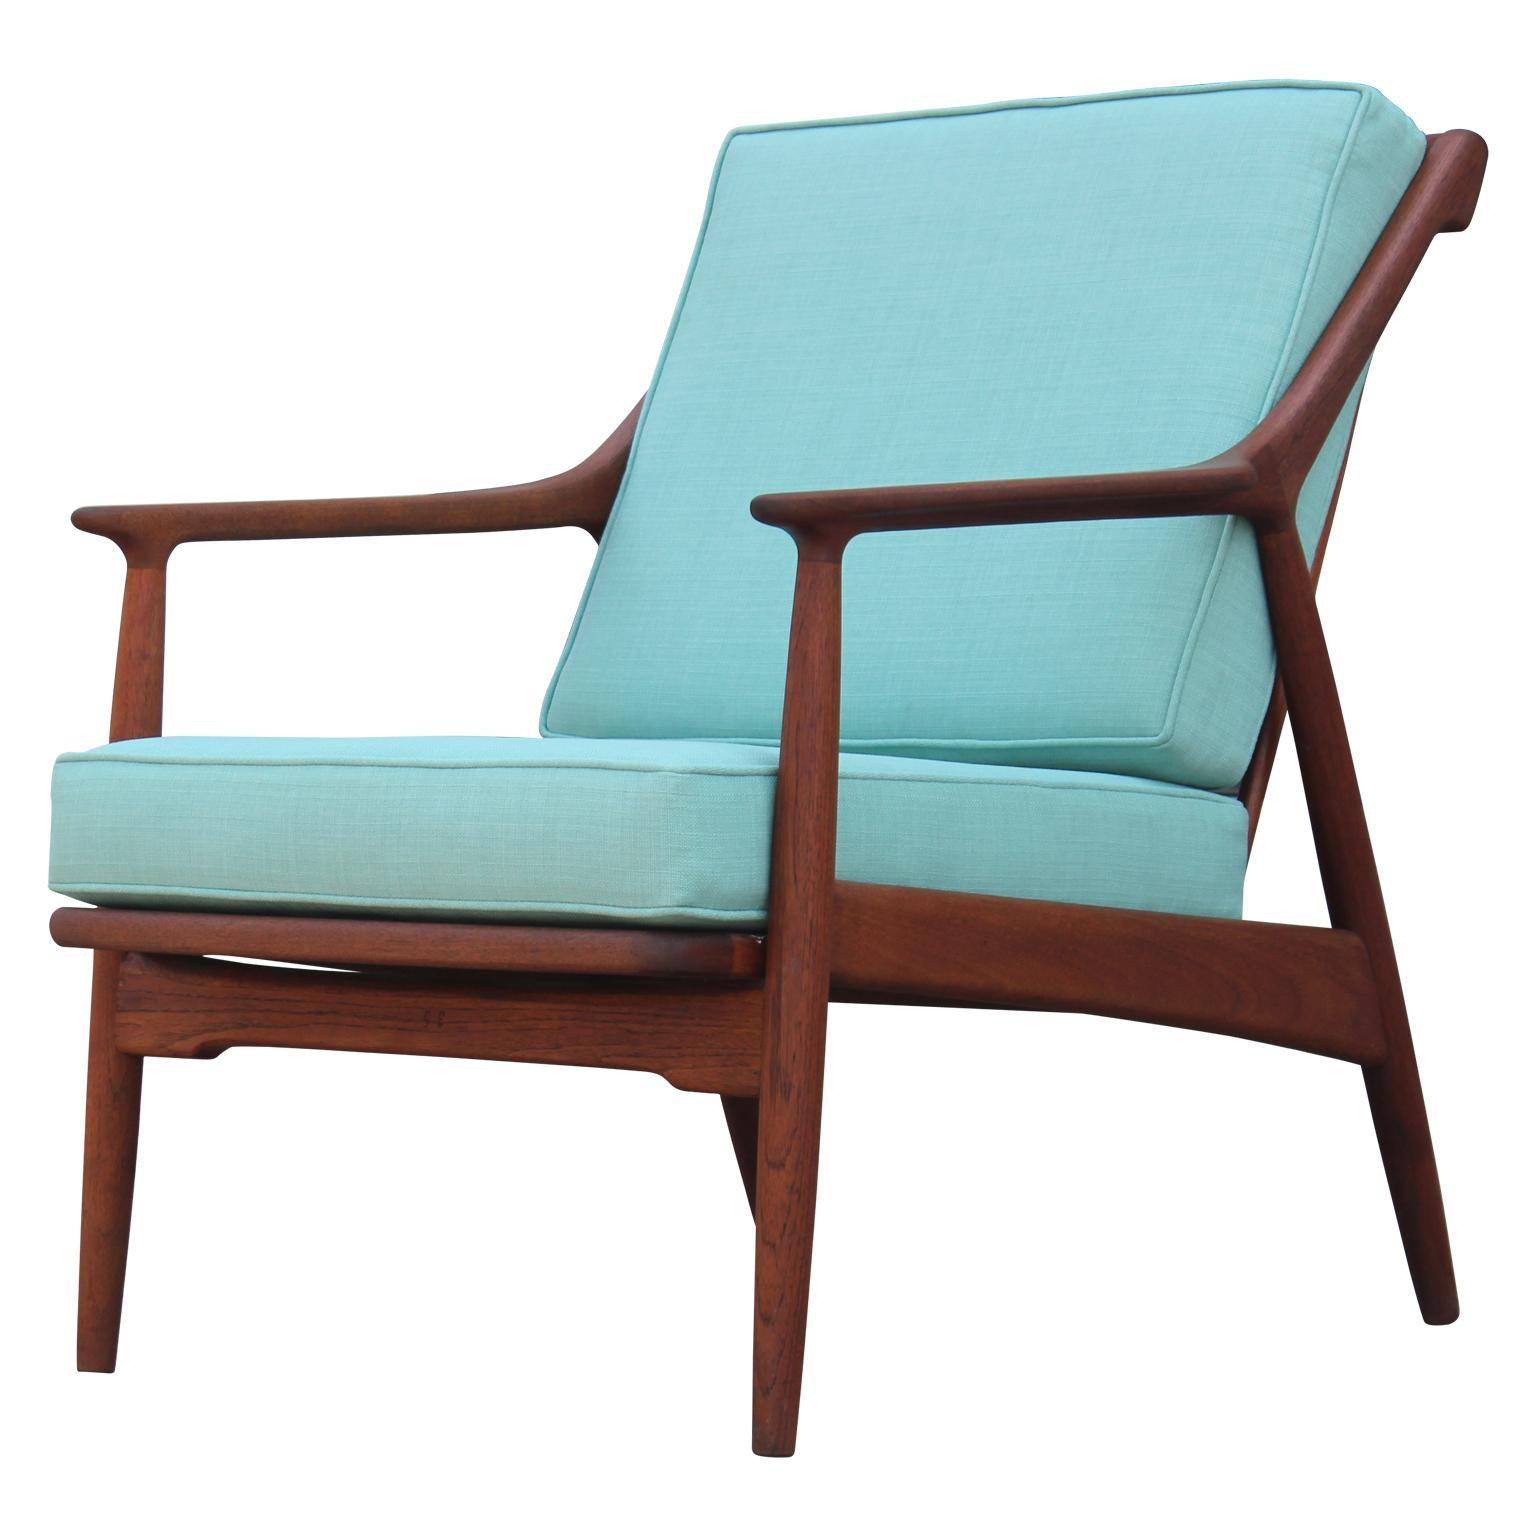 modern danish teak spindle back lounge chair in turquoise by jason rh 1stdibs com modern danish furniture canada modern danish furniture dk